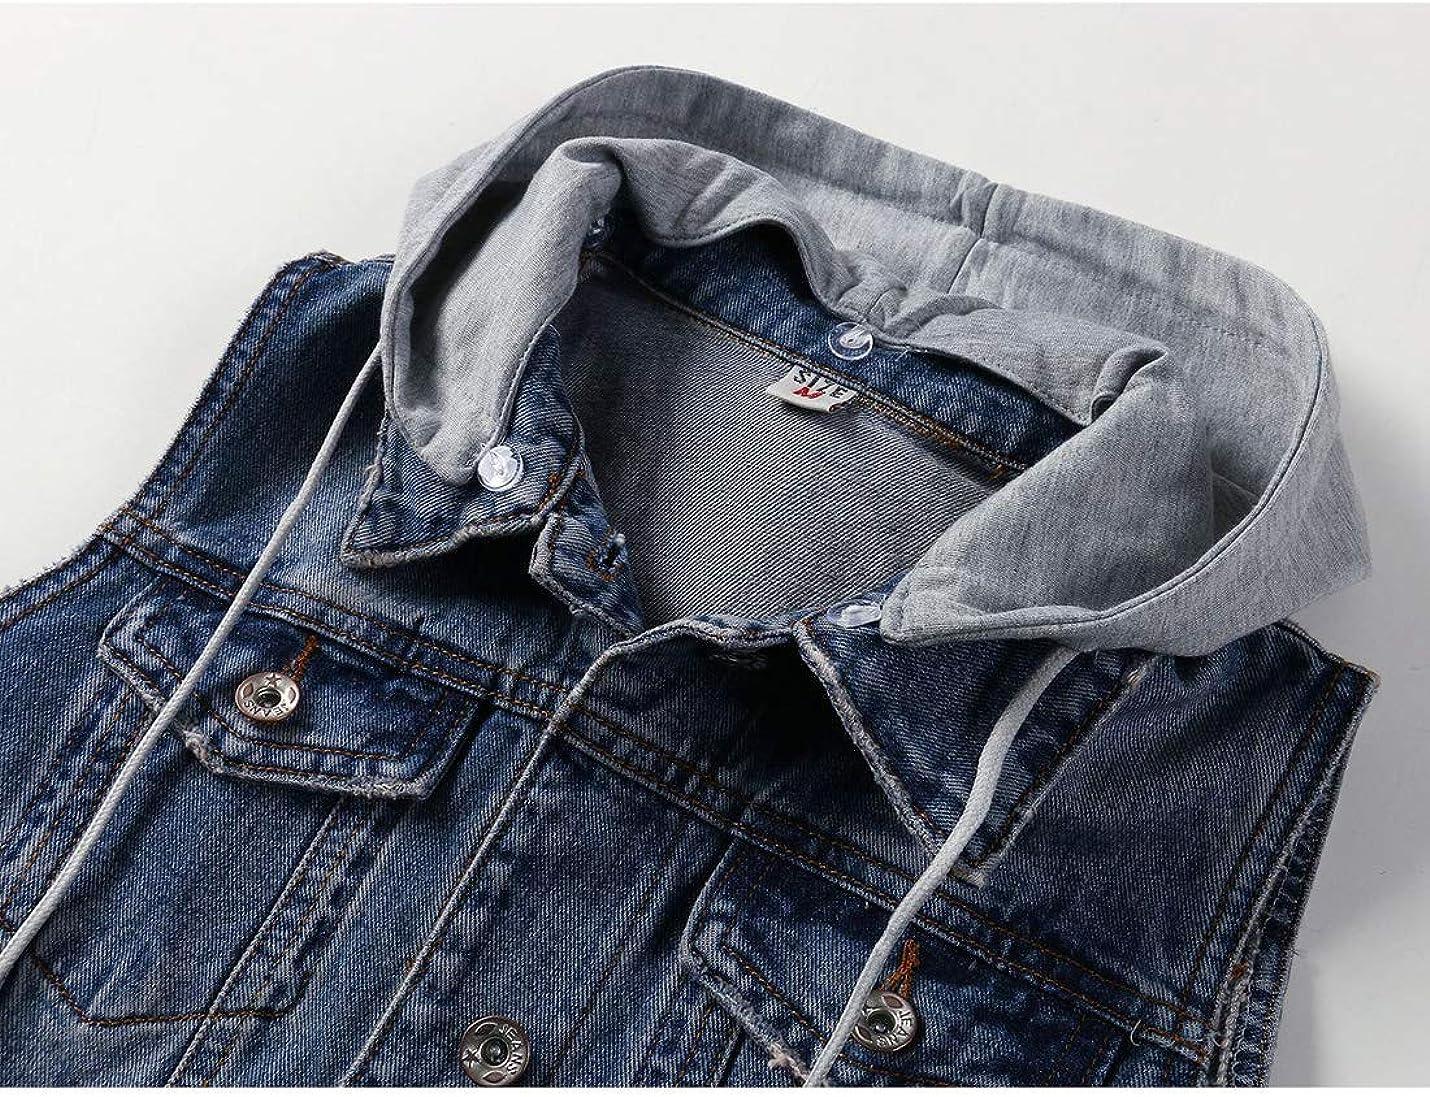 Yimoon Women's Casual Hooded Denim Vest Sleeveless Button Down Jean Jacket